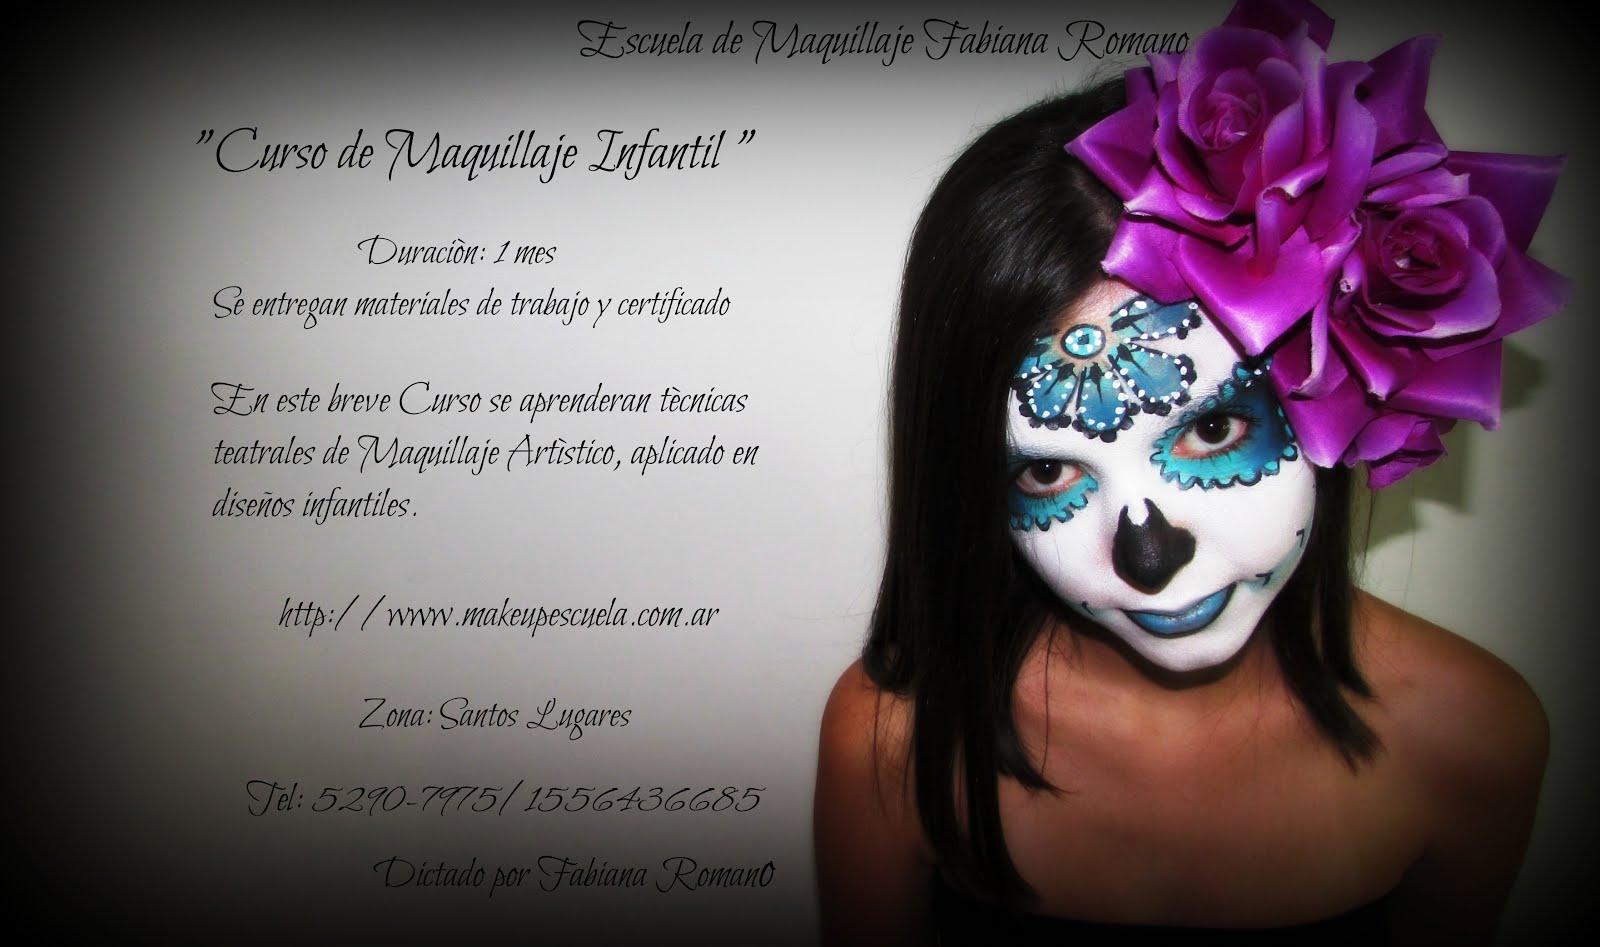 Curso de Maquillaje Artistico 2016